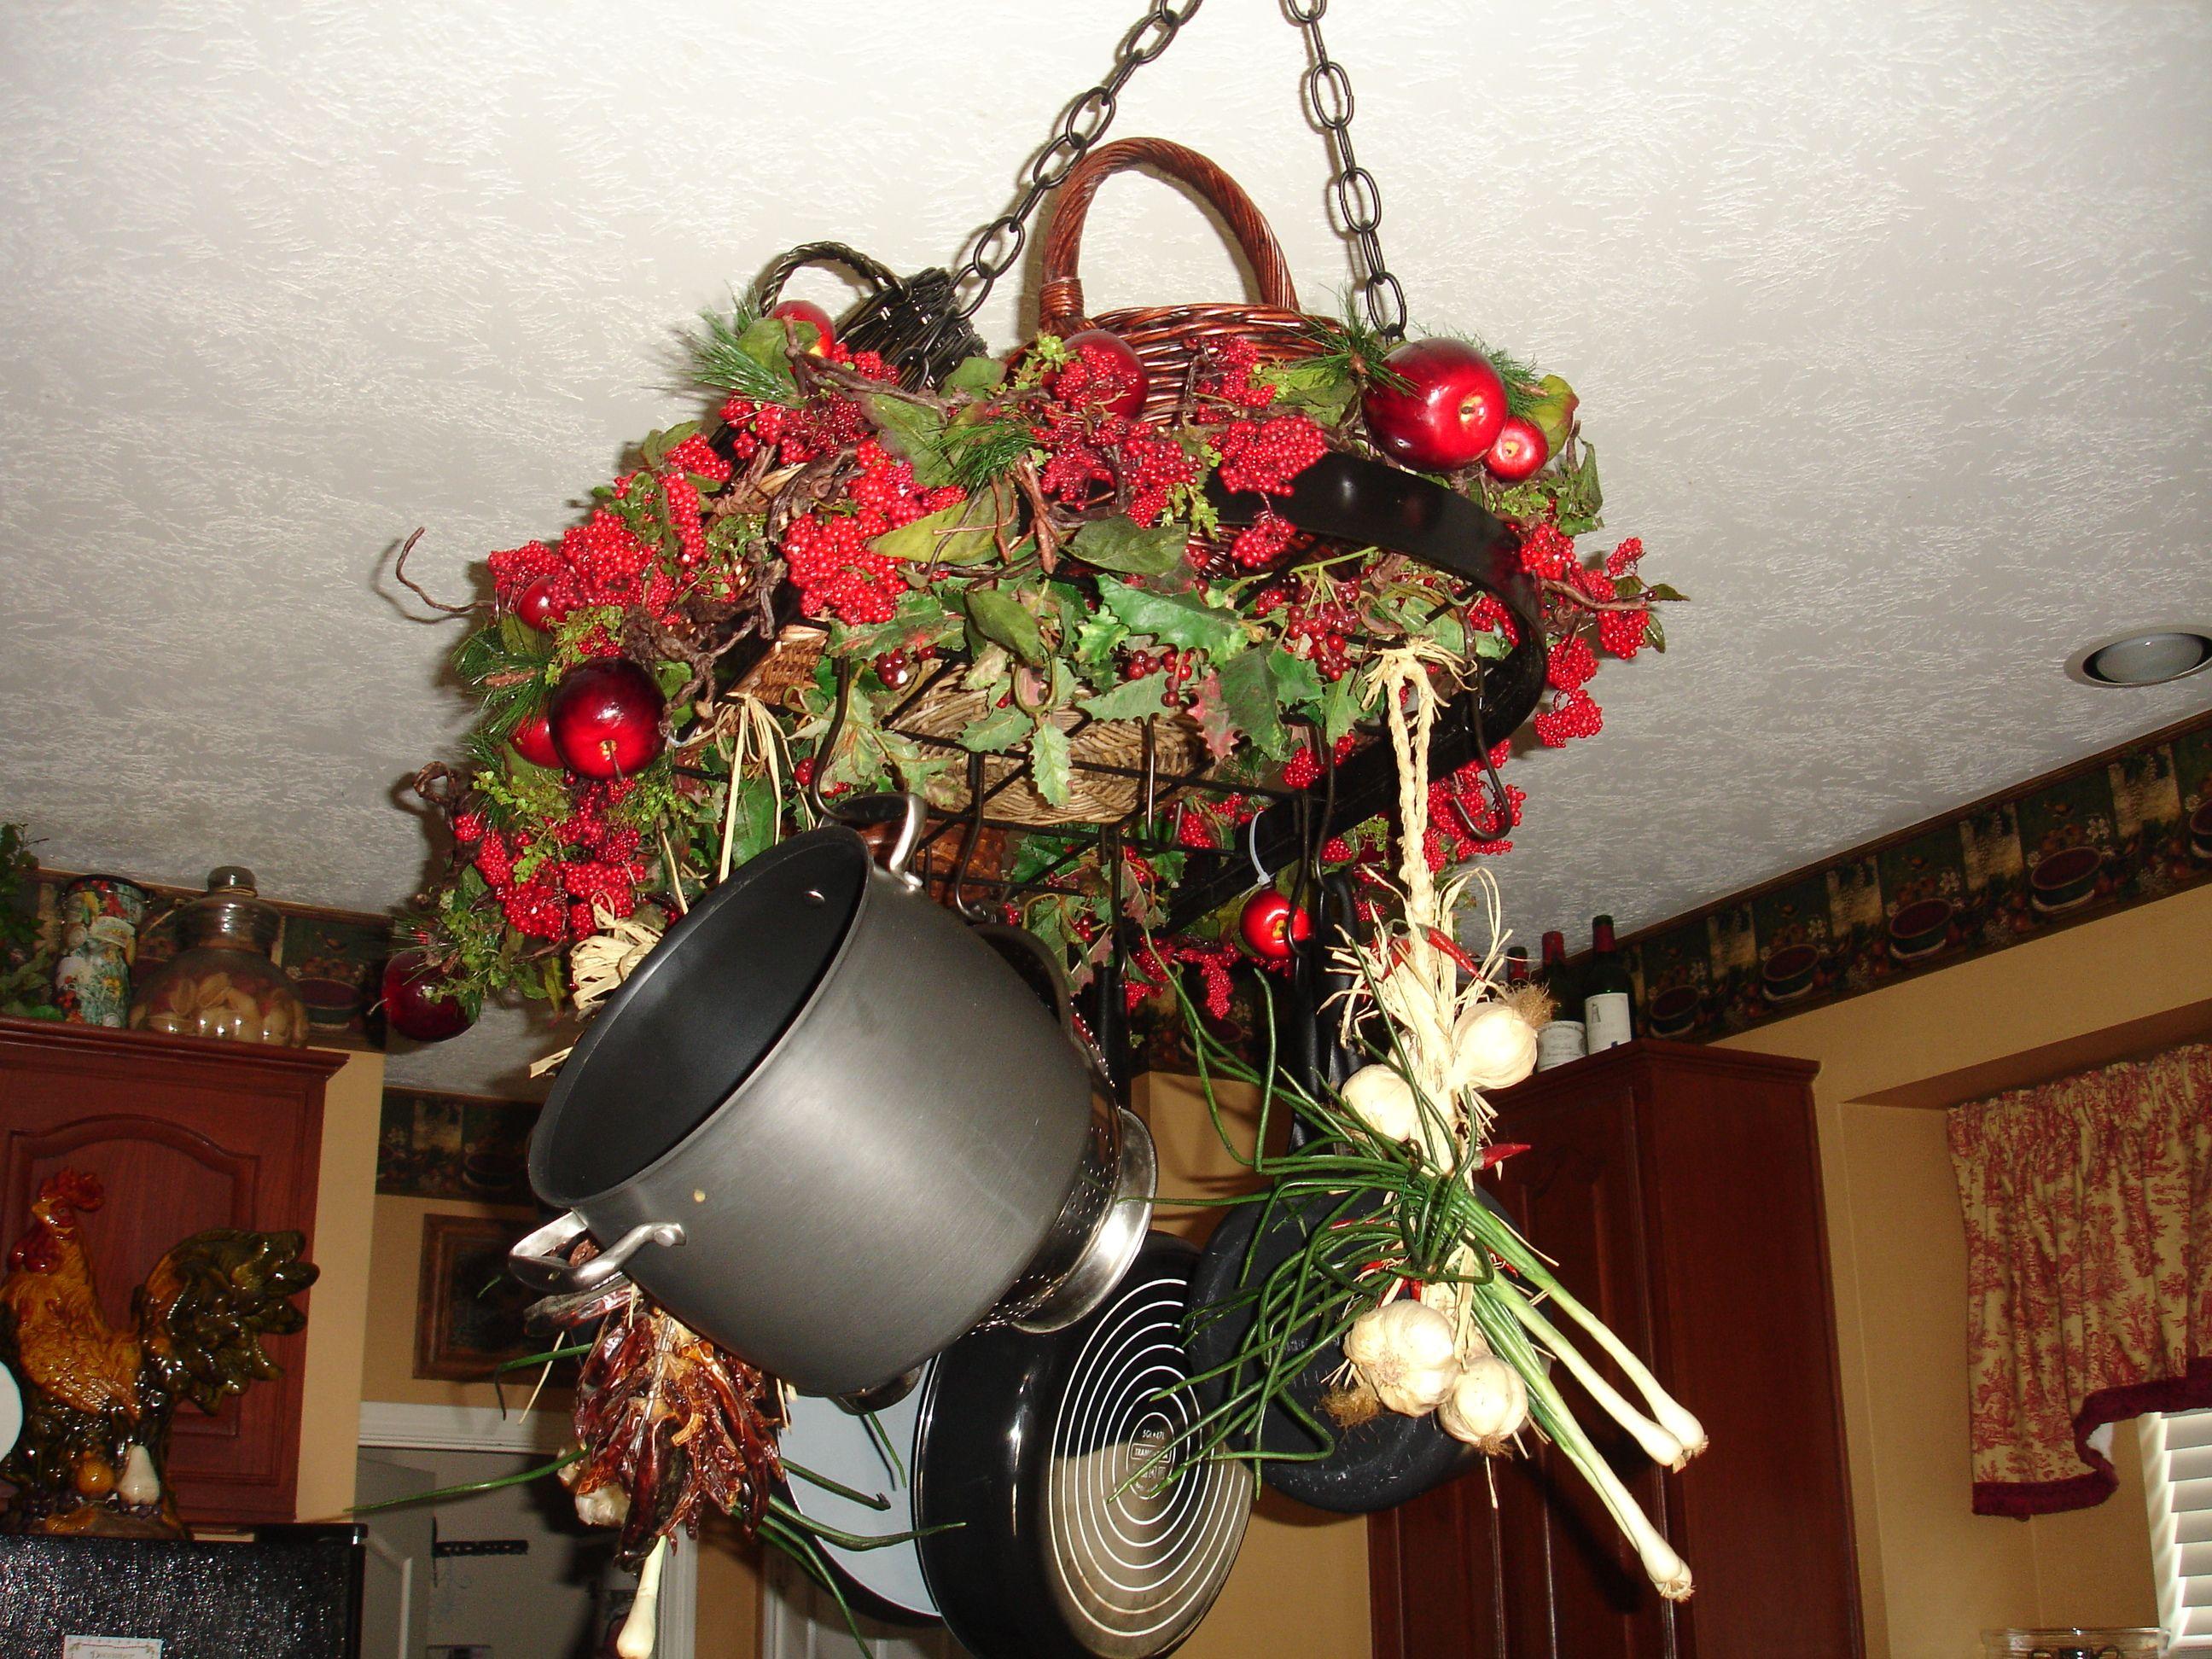 Pot Rack | Christmas decorations, Decor, Pot rack